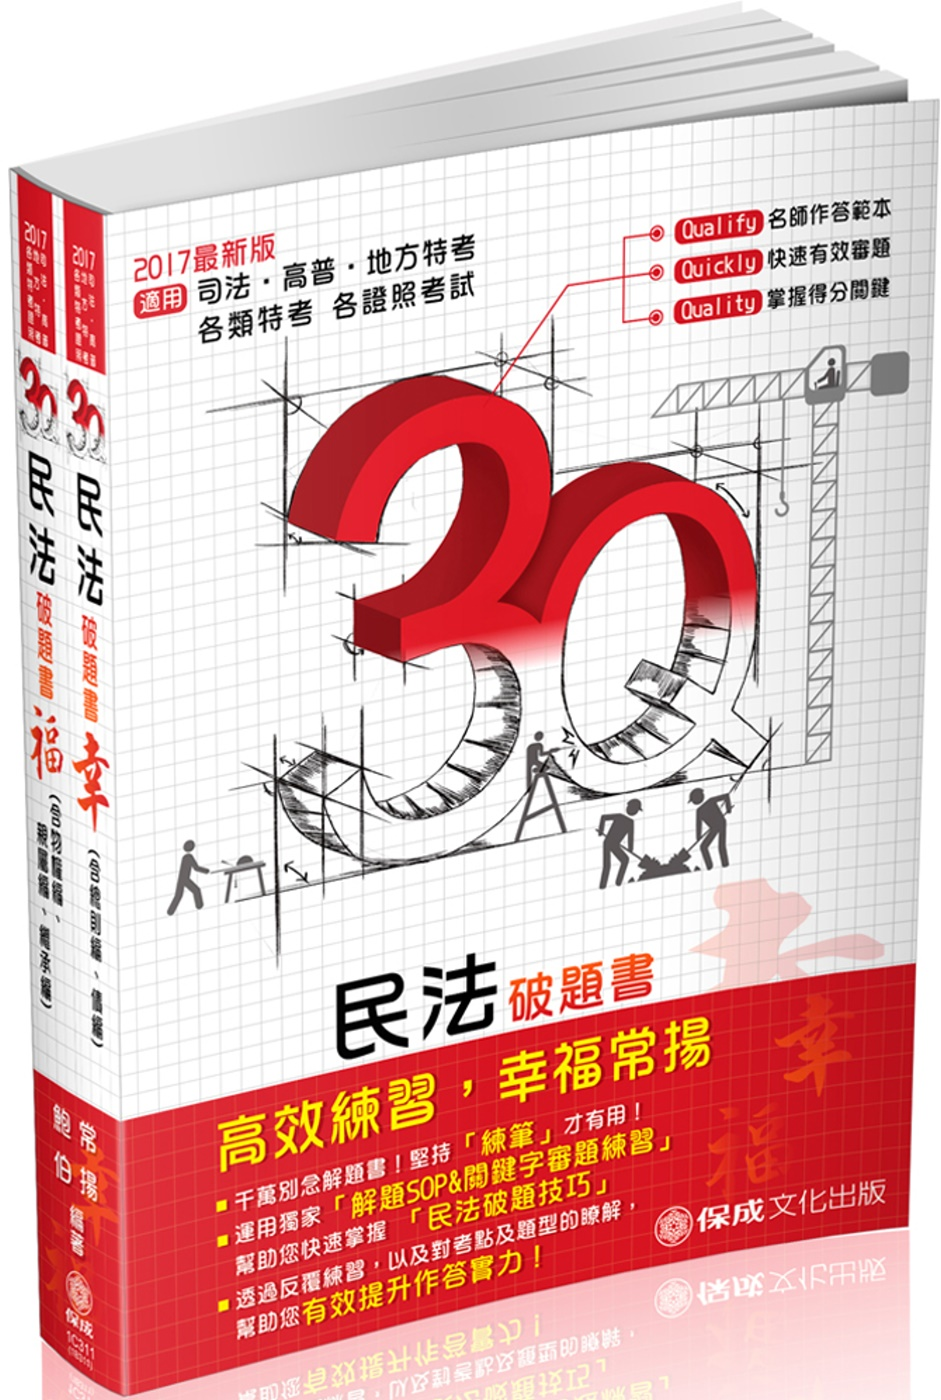 3Q民法-破題書(幸.福)-2017高普.地方特考.司法特考<保成>(二版)